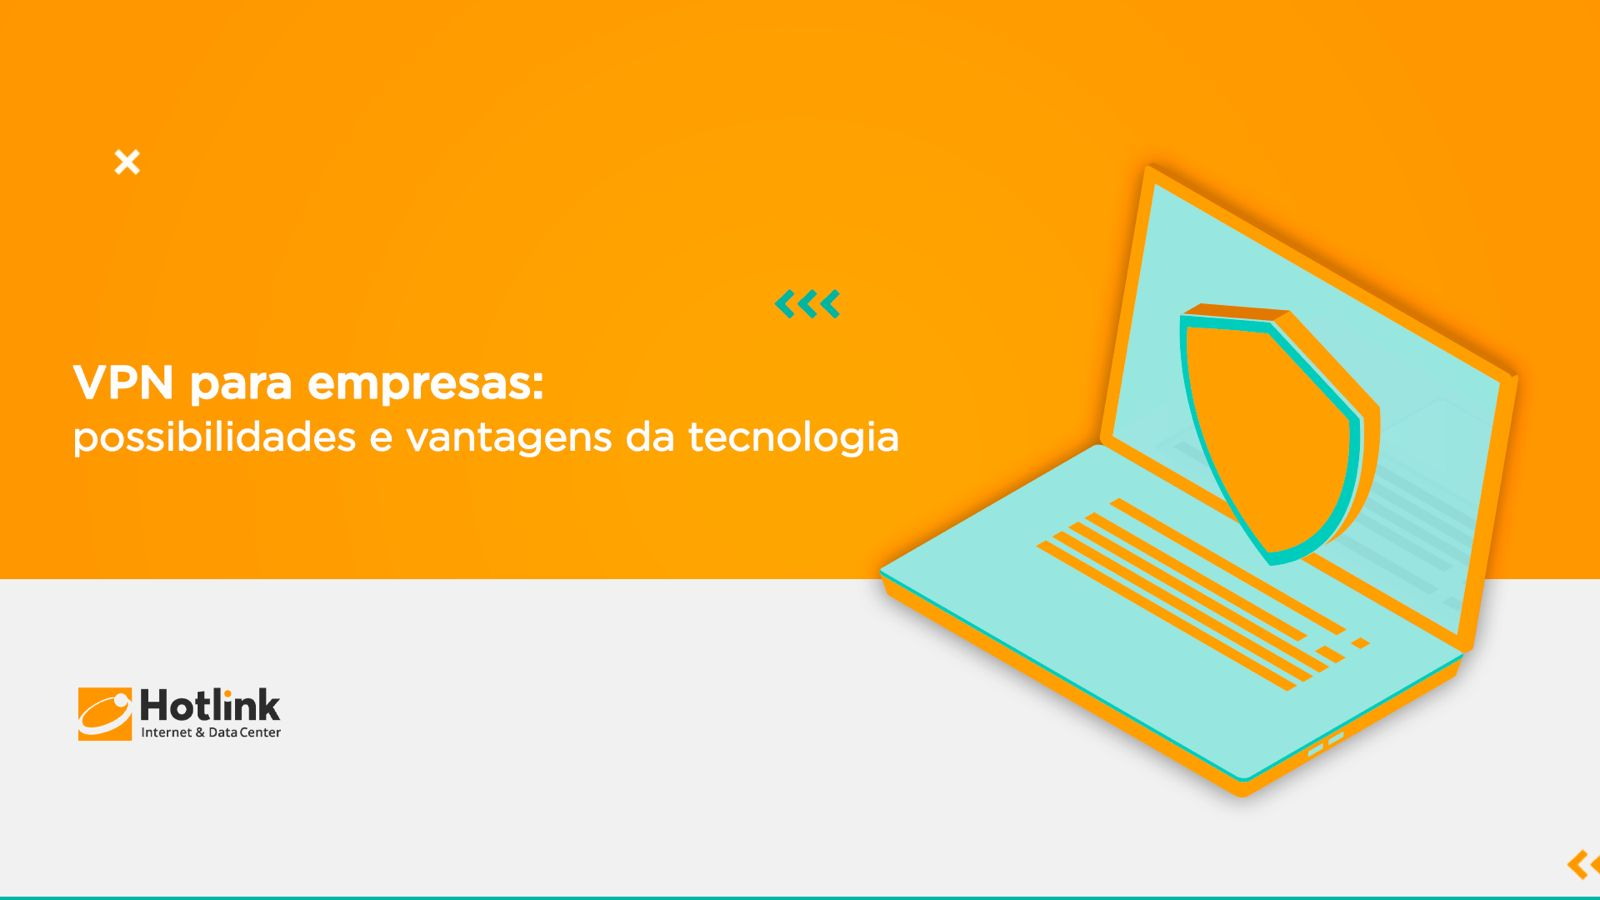 You are currently viewing VPN para empresas: possibilidades e vantagens da tecnologia